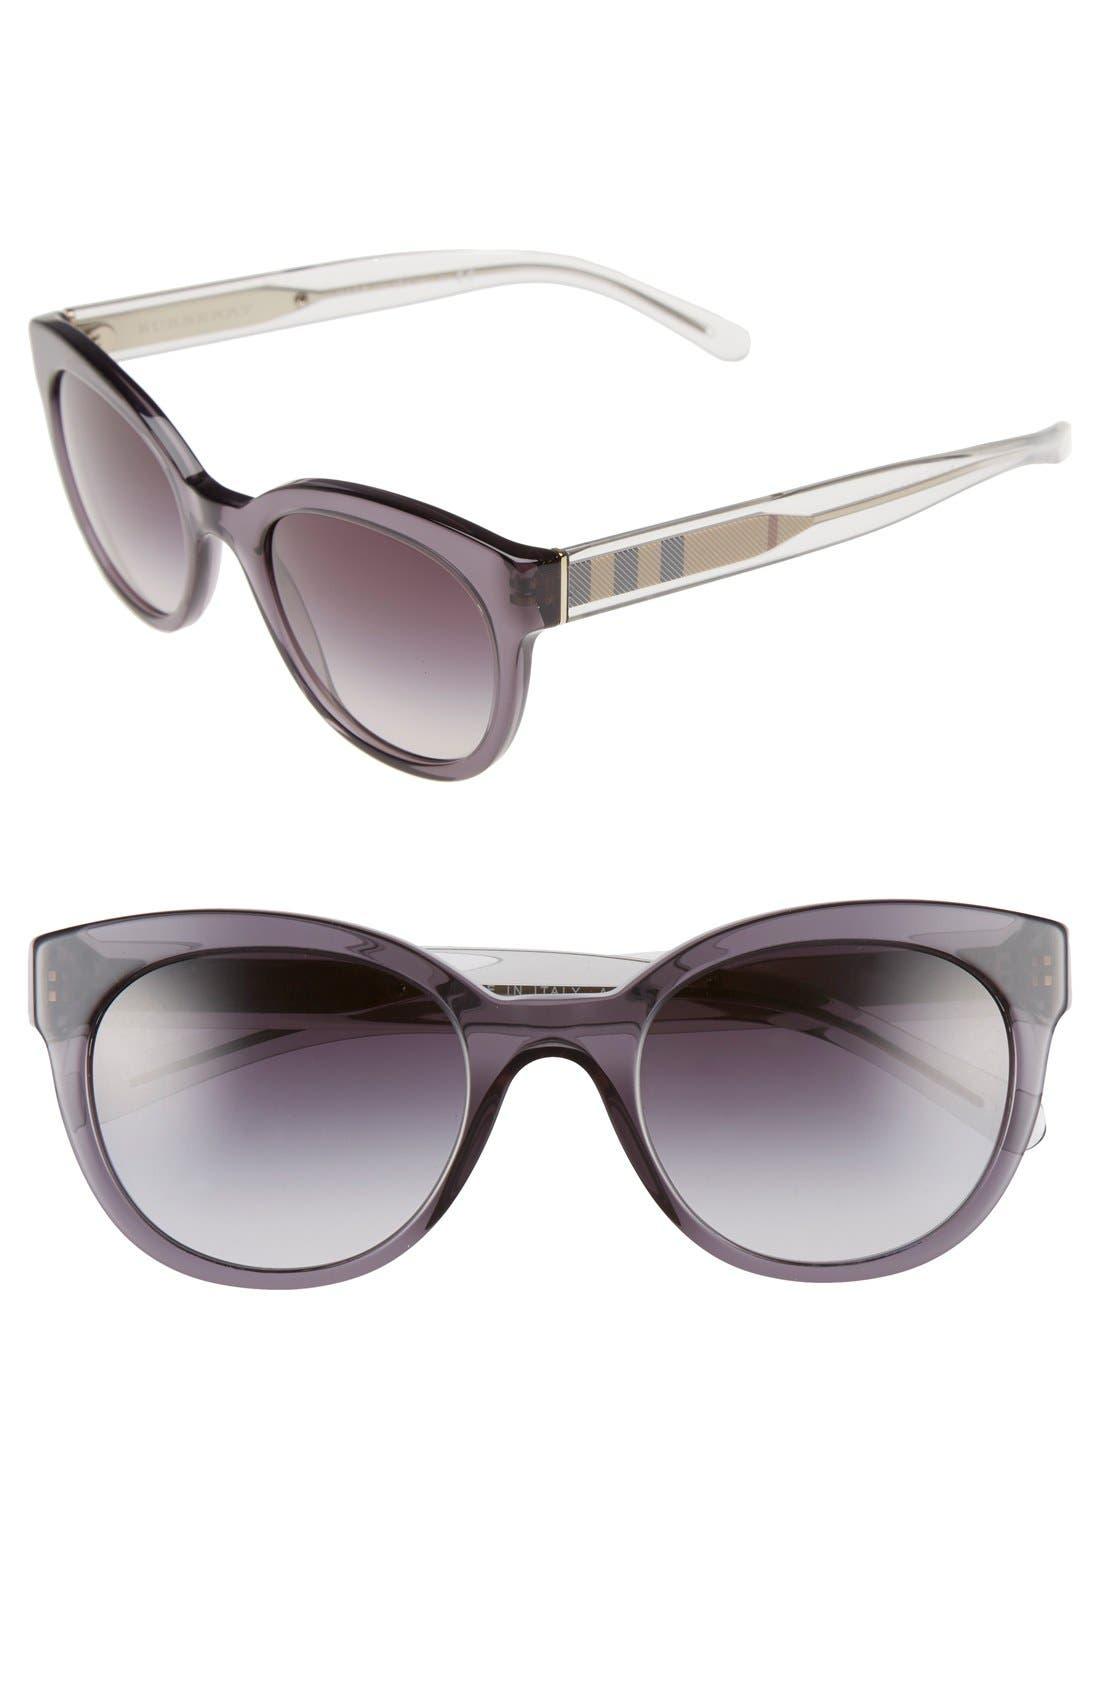 Main Image - Burberry 52mm Retro Sunglasses